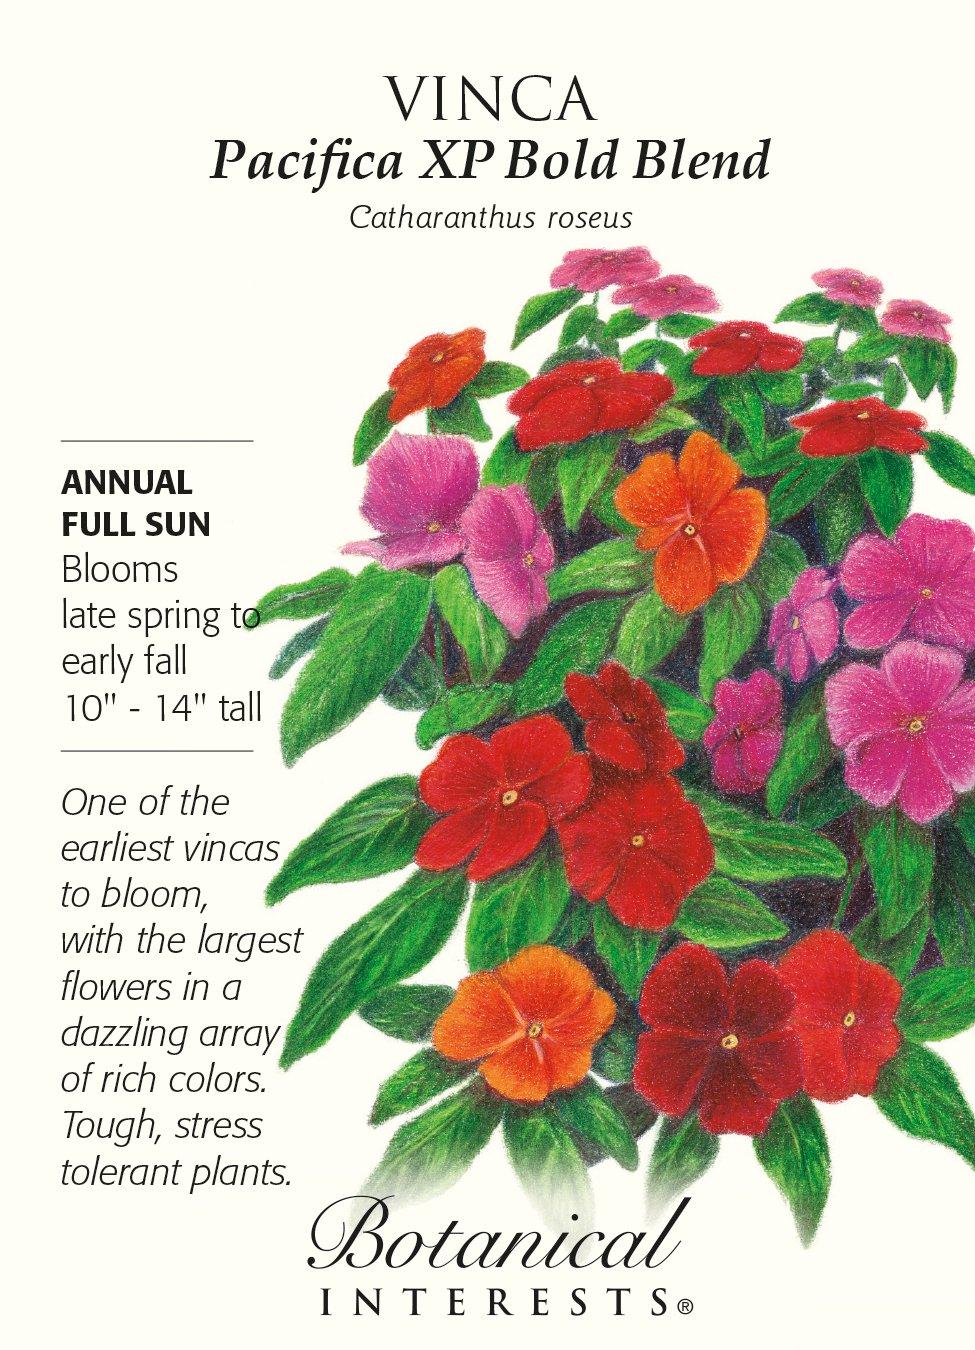 Amazon.com : Pacifica XP Bold Blend Vinca Seeds - 30 mg - Botanical ...